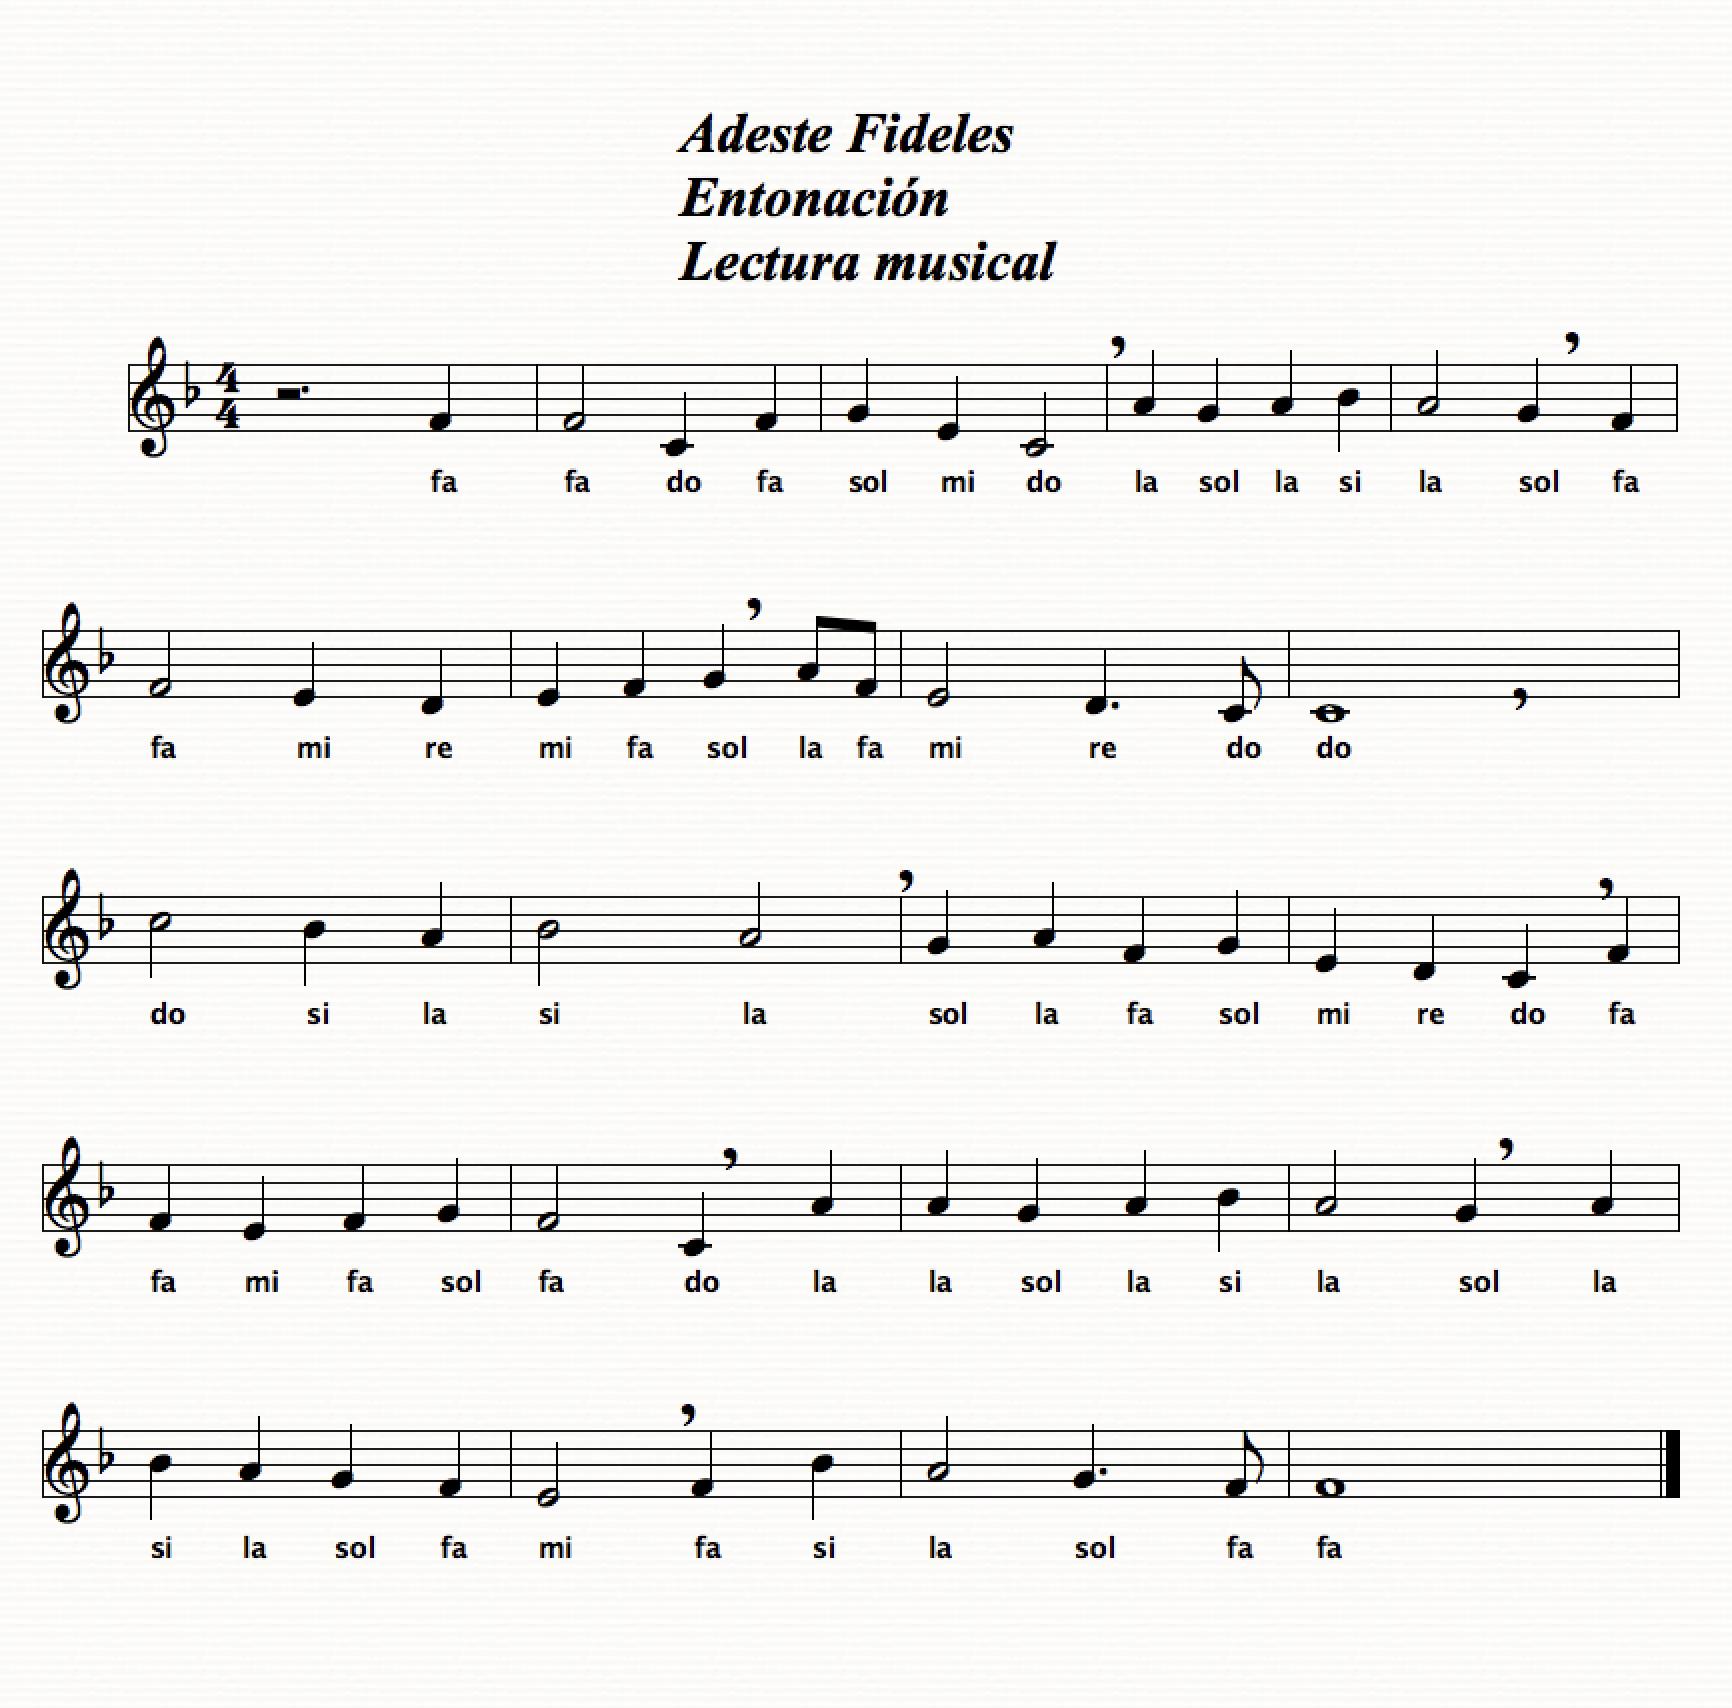 adeste fideles lectura musical